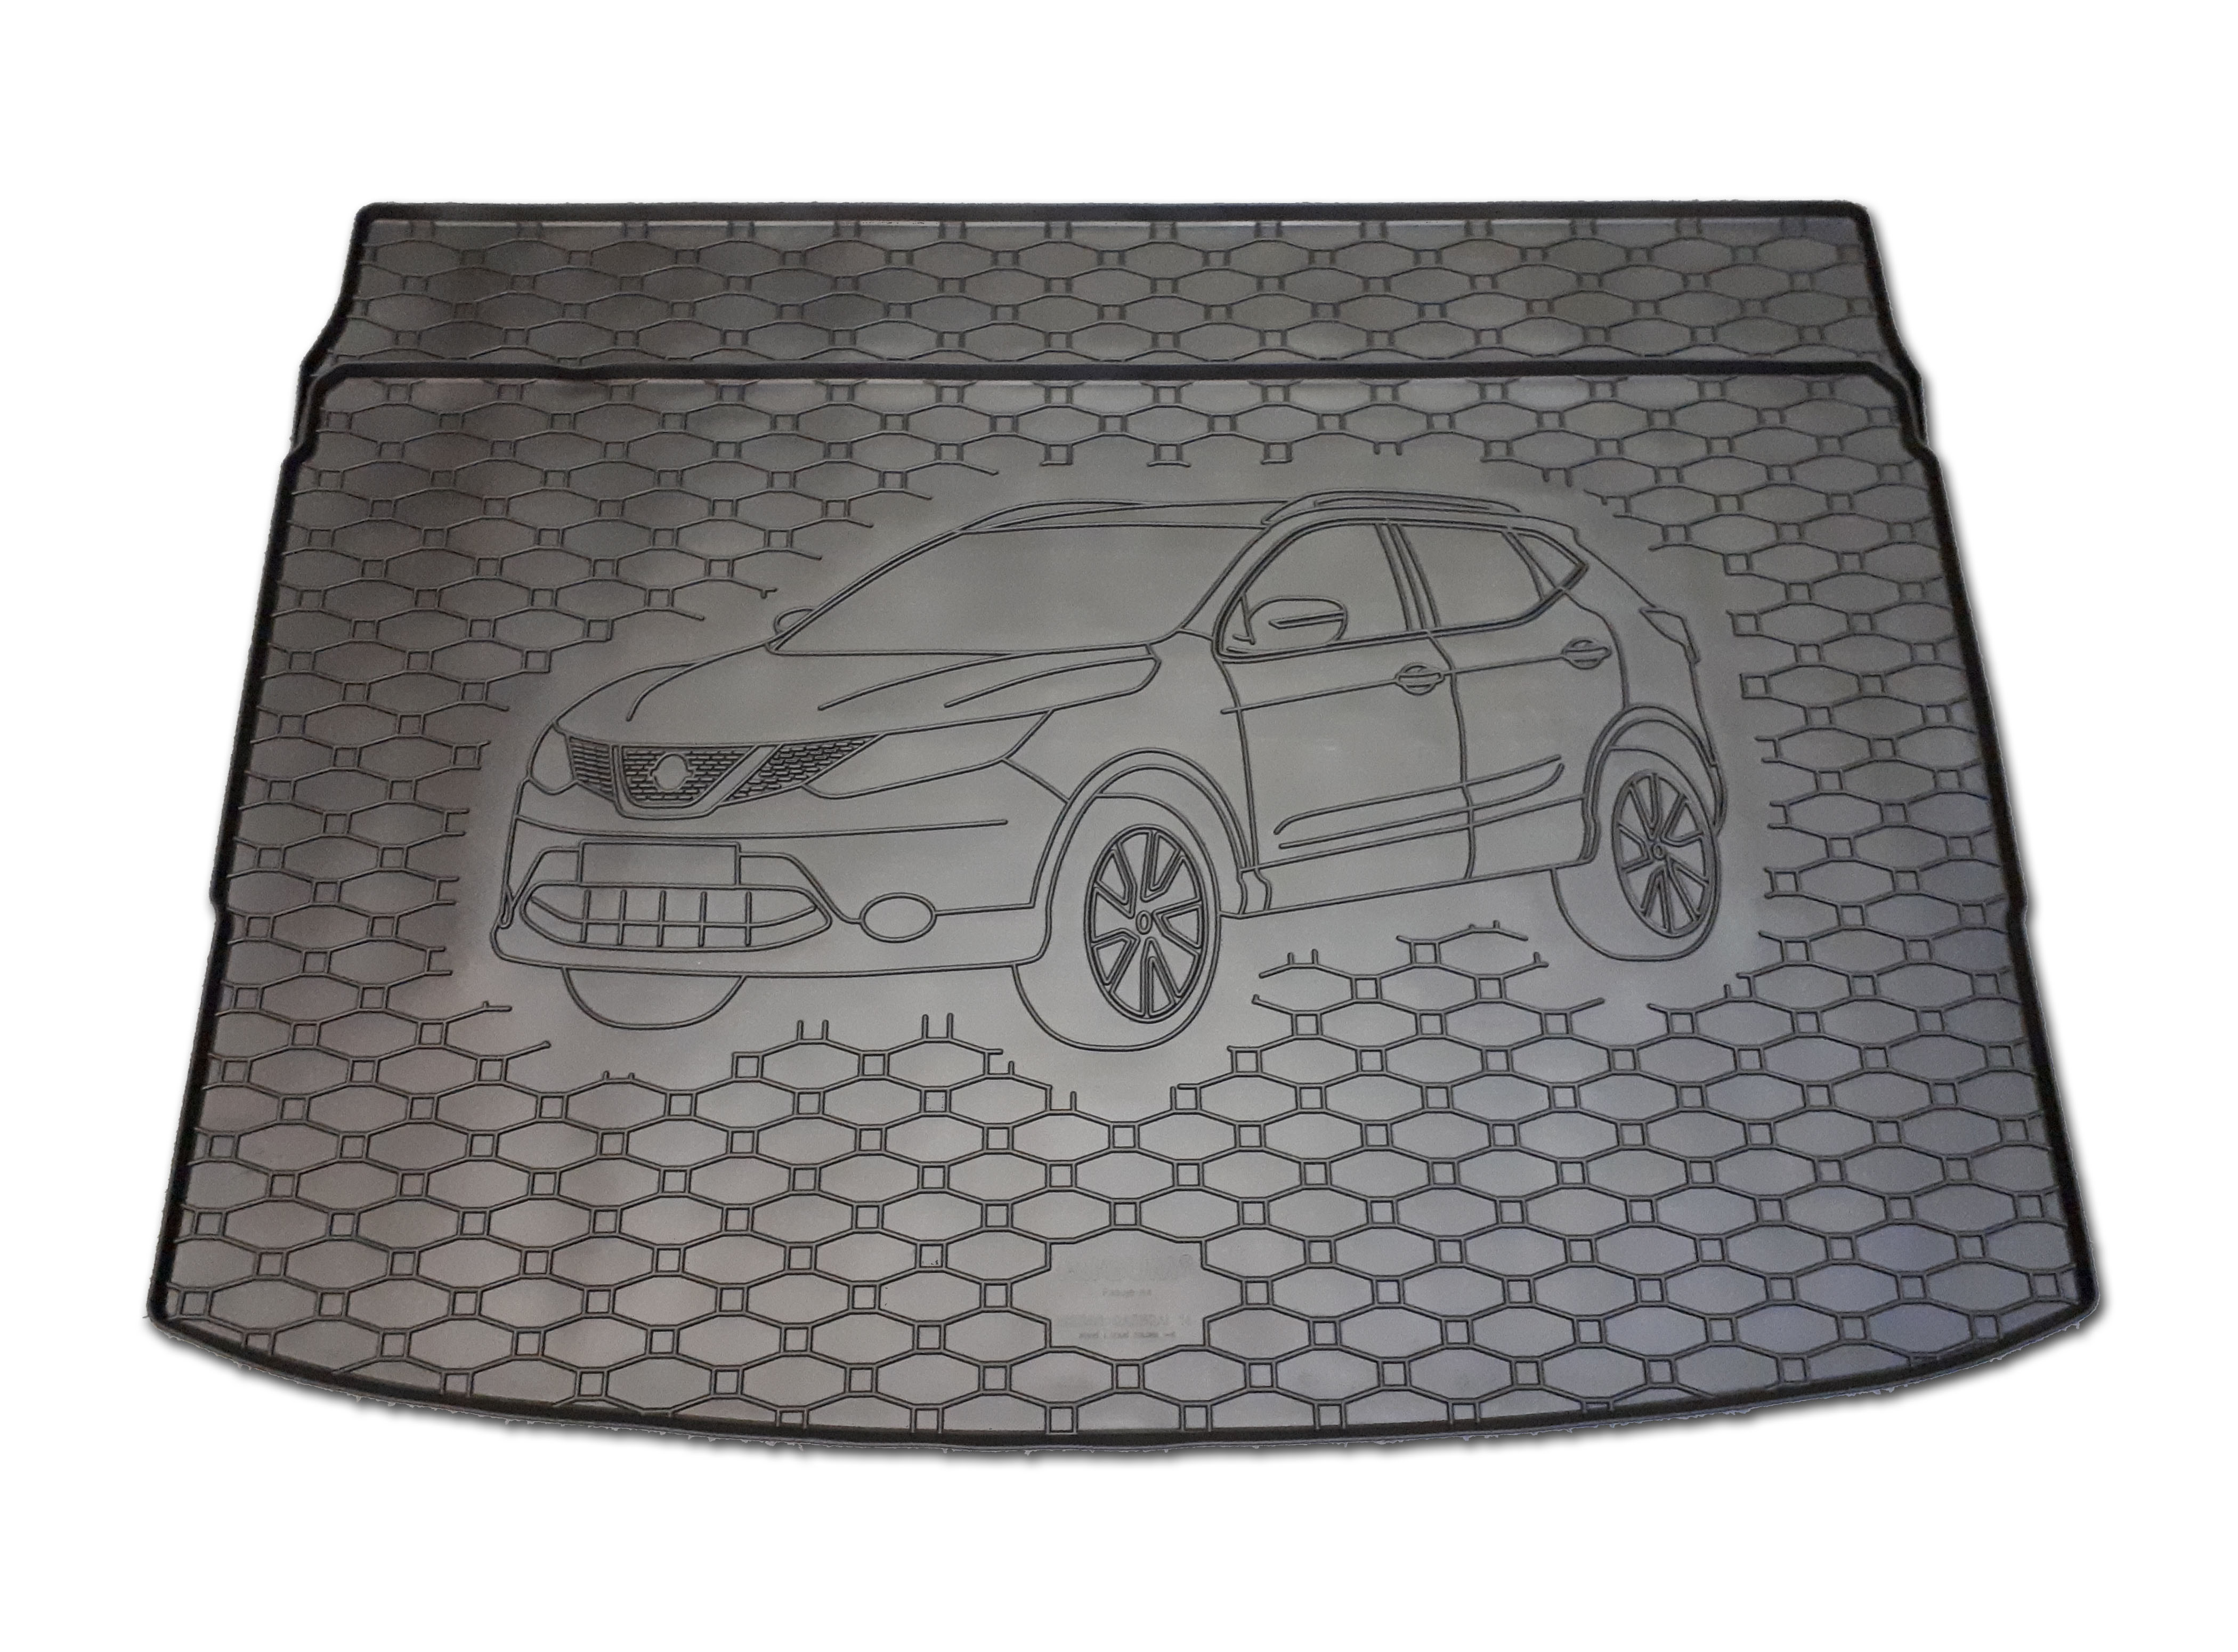 Vana do kufru gumová Nissan Qashqai 2014- horní i dolní poloha